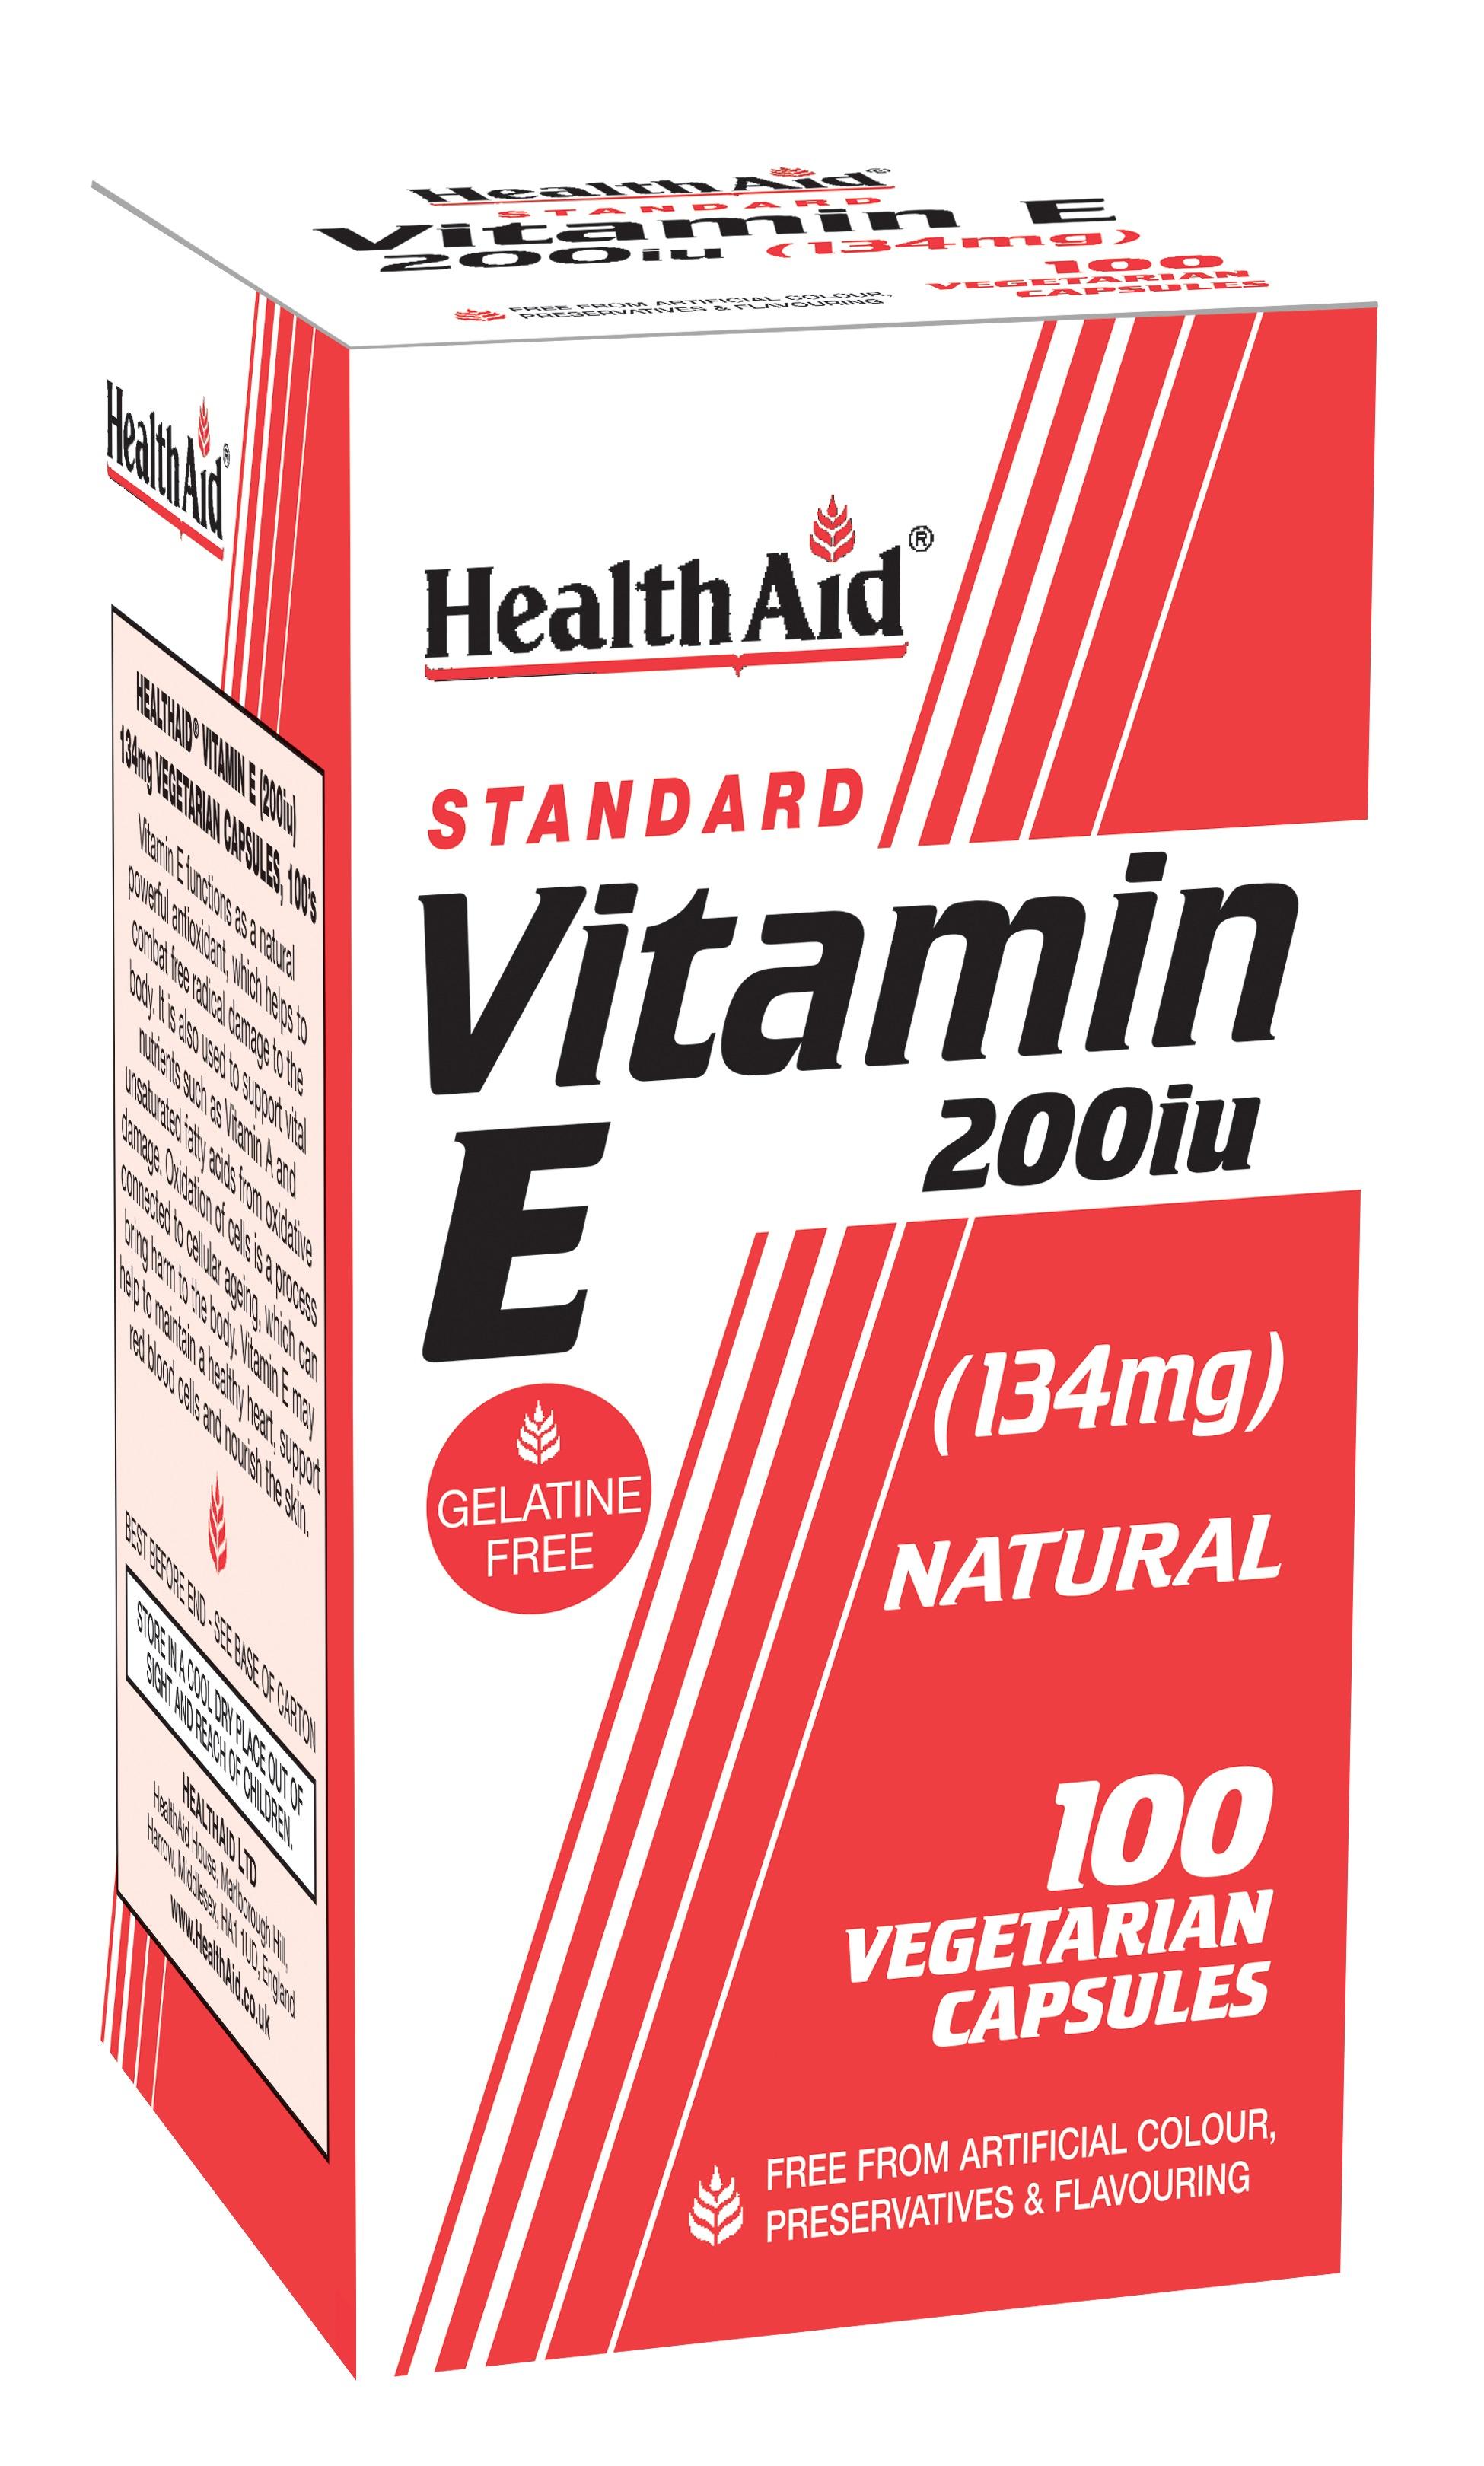 Standard Vitamin E 200iu 100's